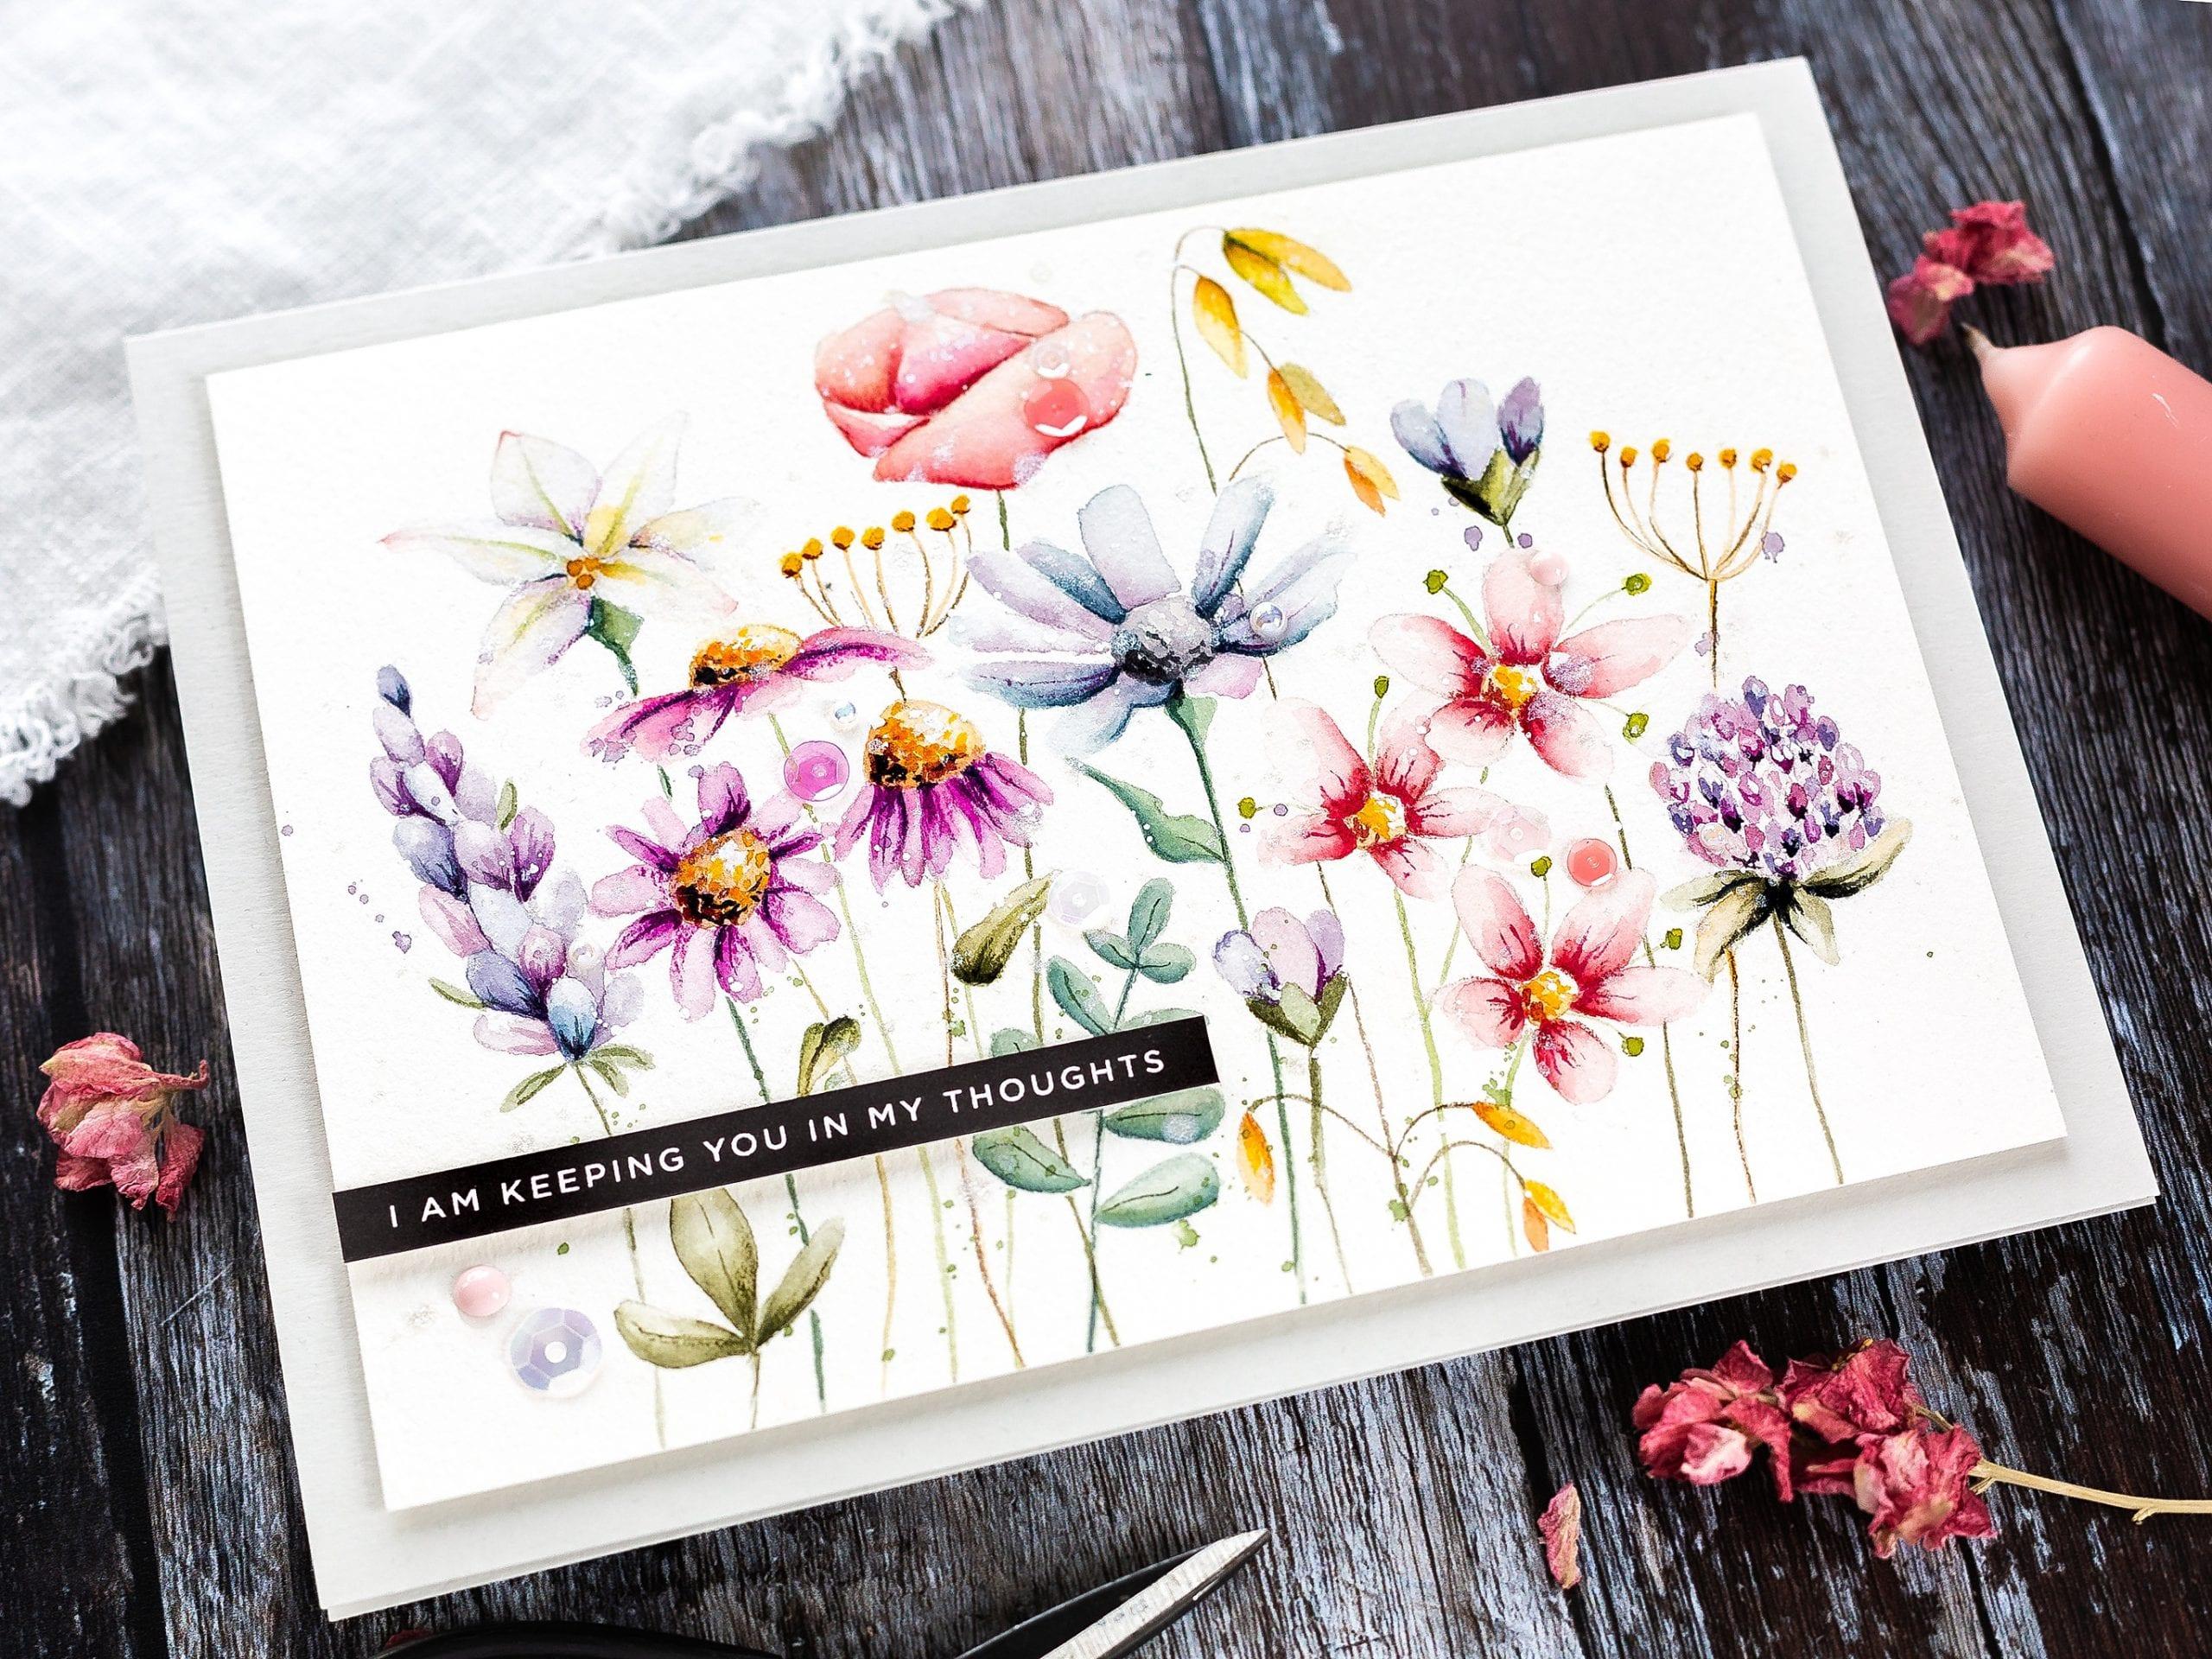 Watercoloured Wild Flower Meadow + New Simon Release